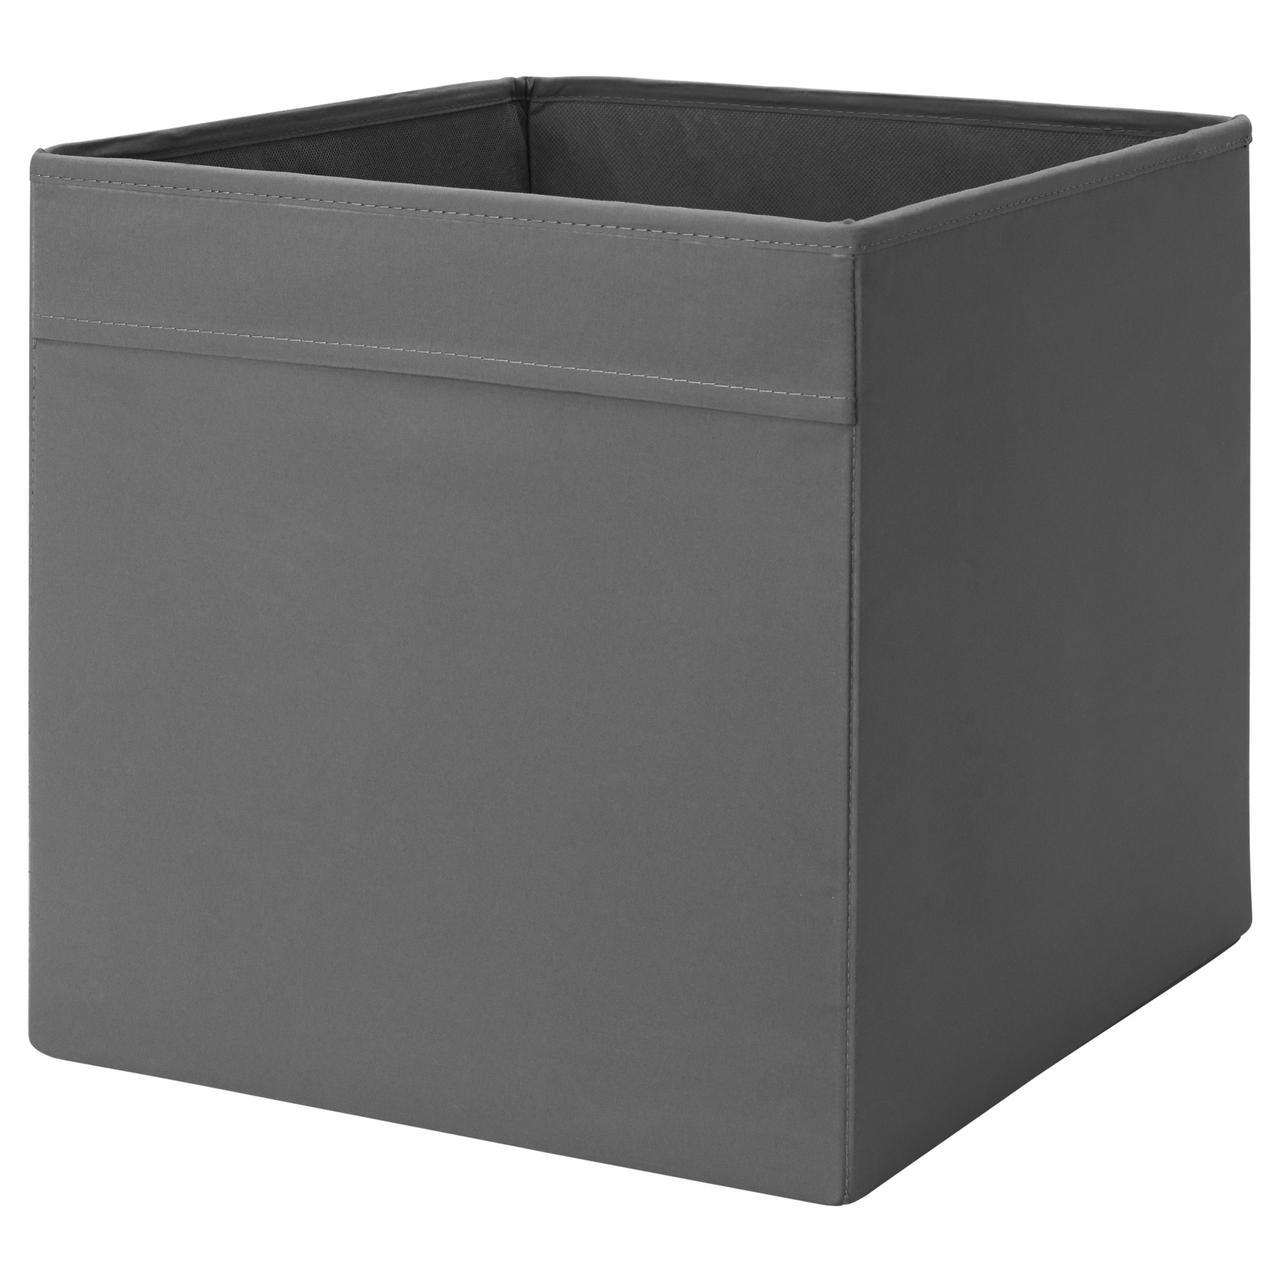 ДРЁНА Ящик, темно-серый, 33x38x33 см, 10443974, IKEA, ИКЕА, DRONA